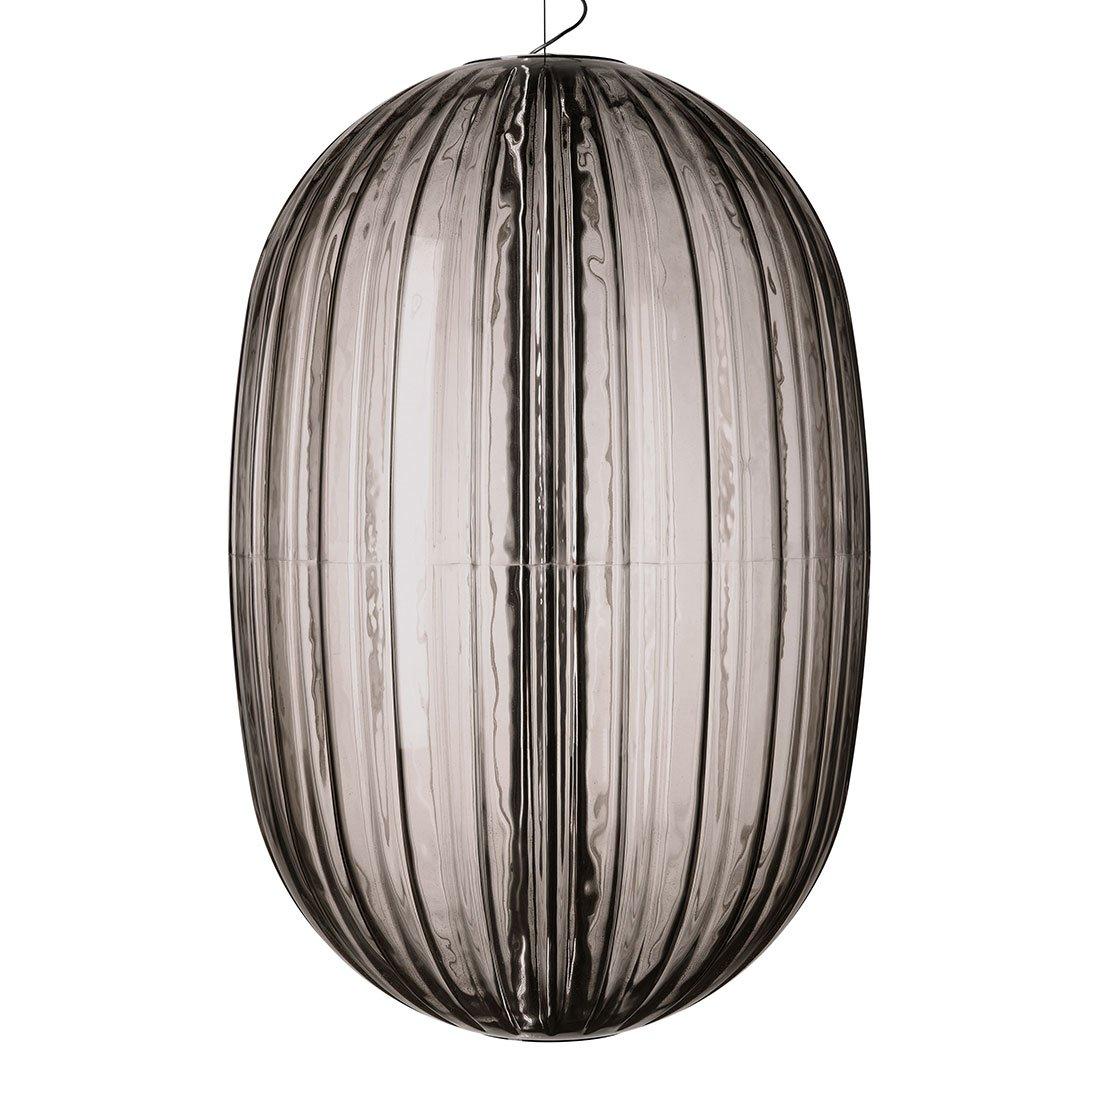 Foscarini Plass Hanglamp Grijs LED